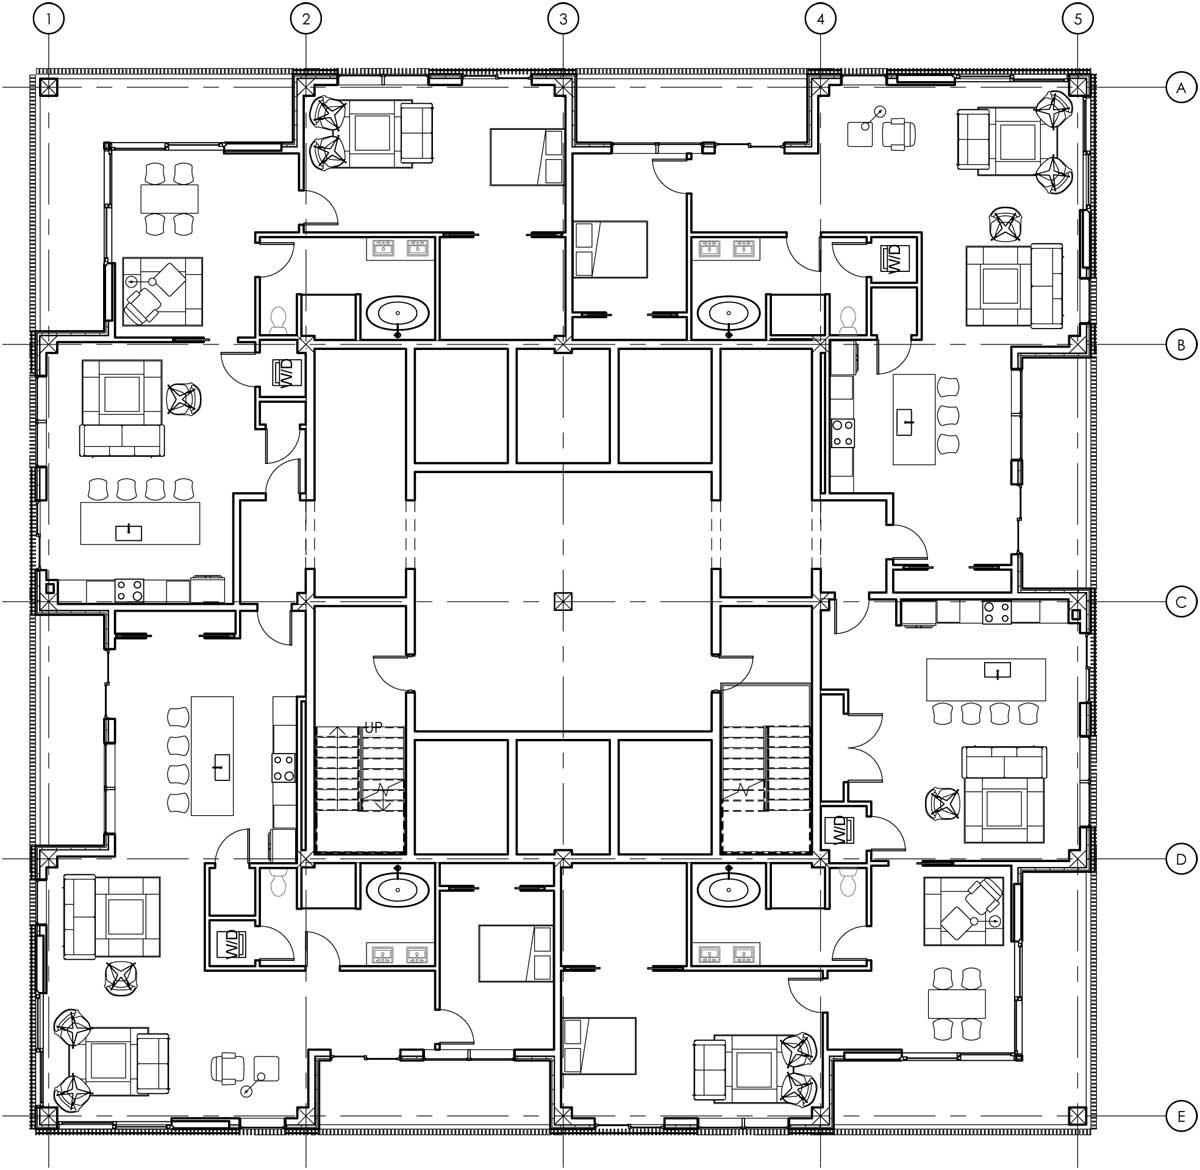 14x30-Timber-Residential-Skyscraper-Plan-b.jpg